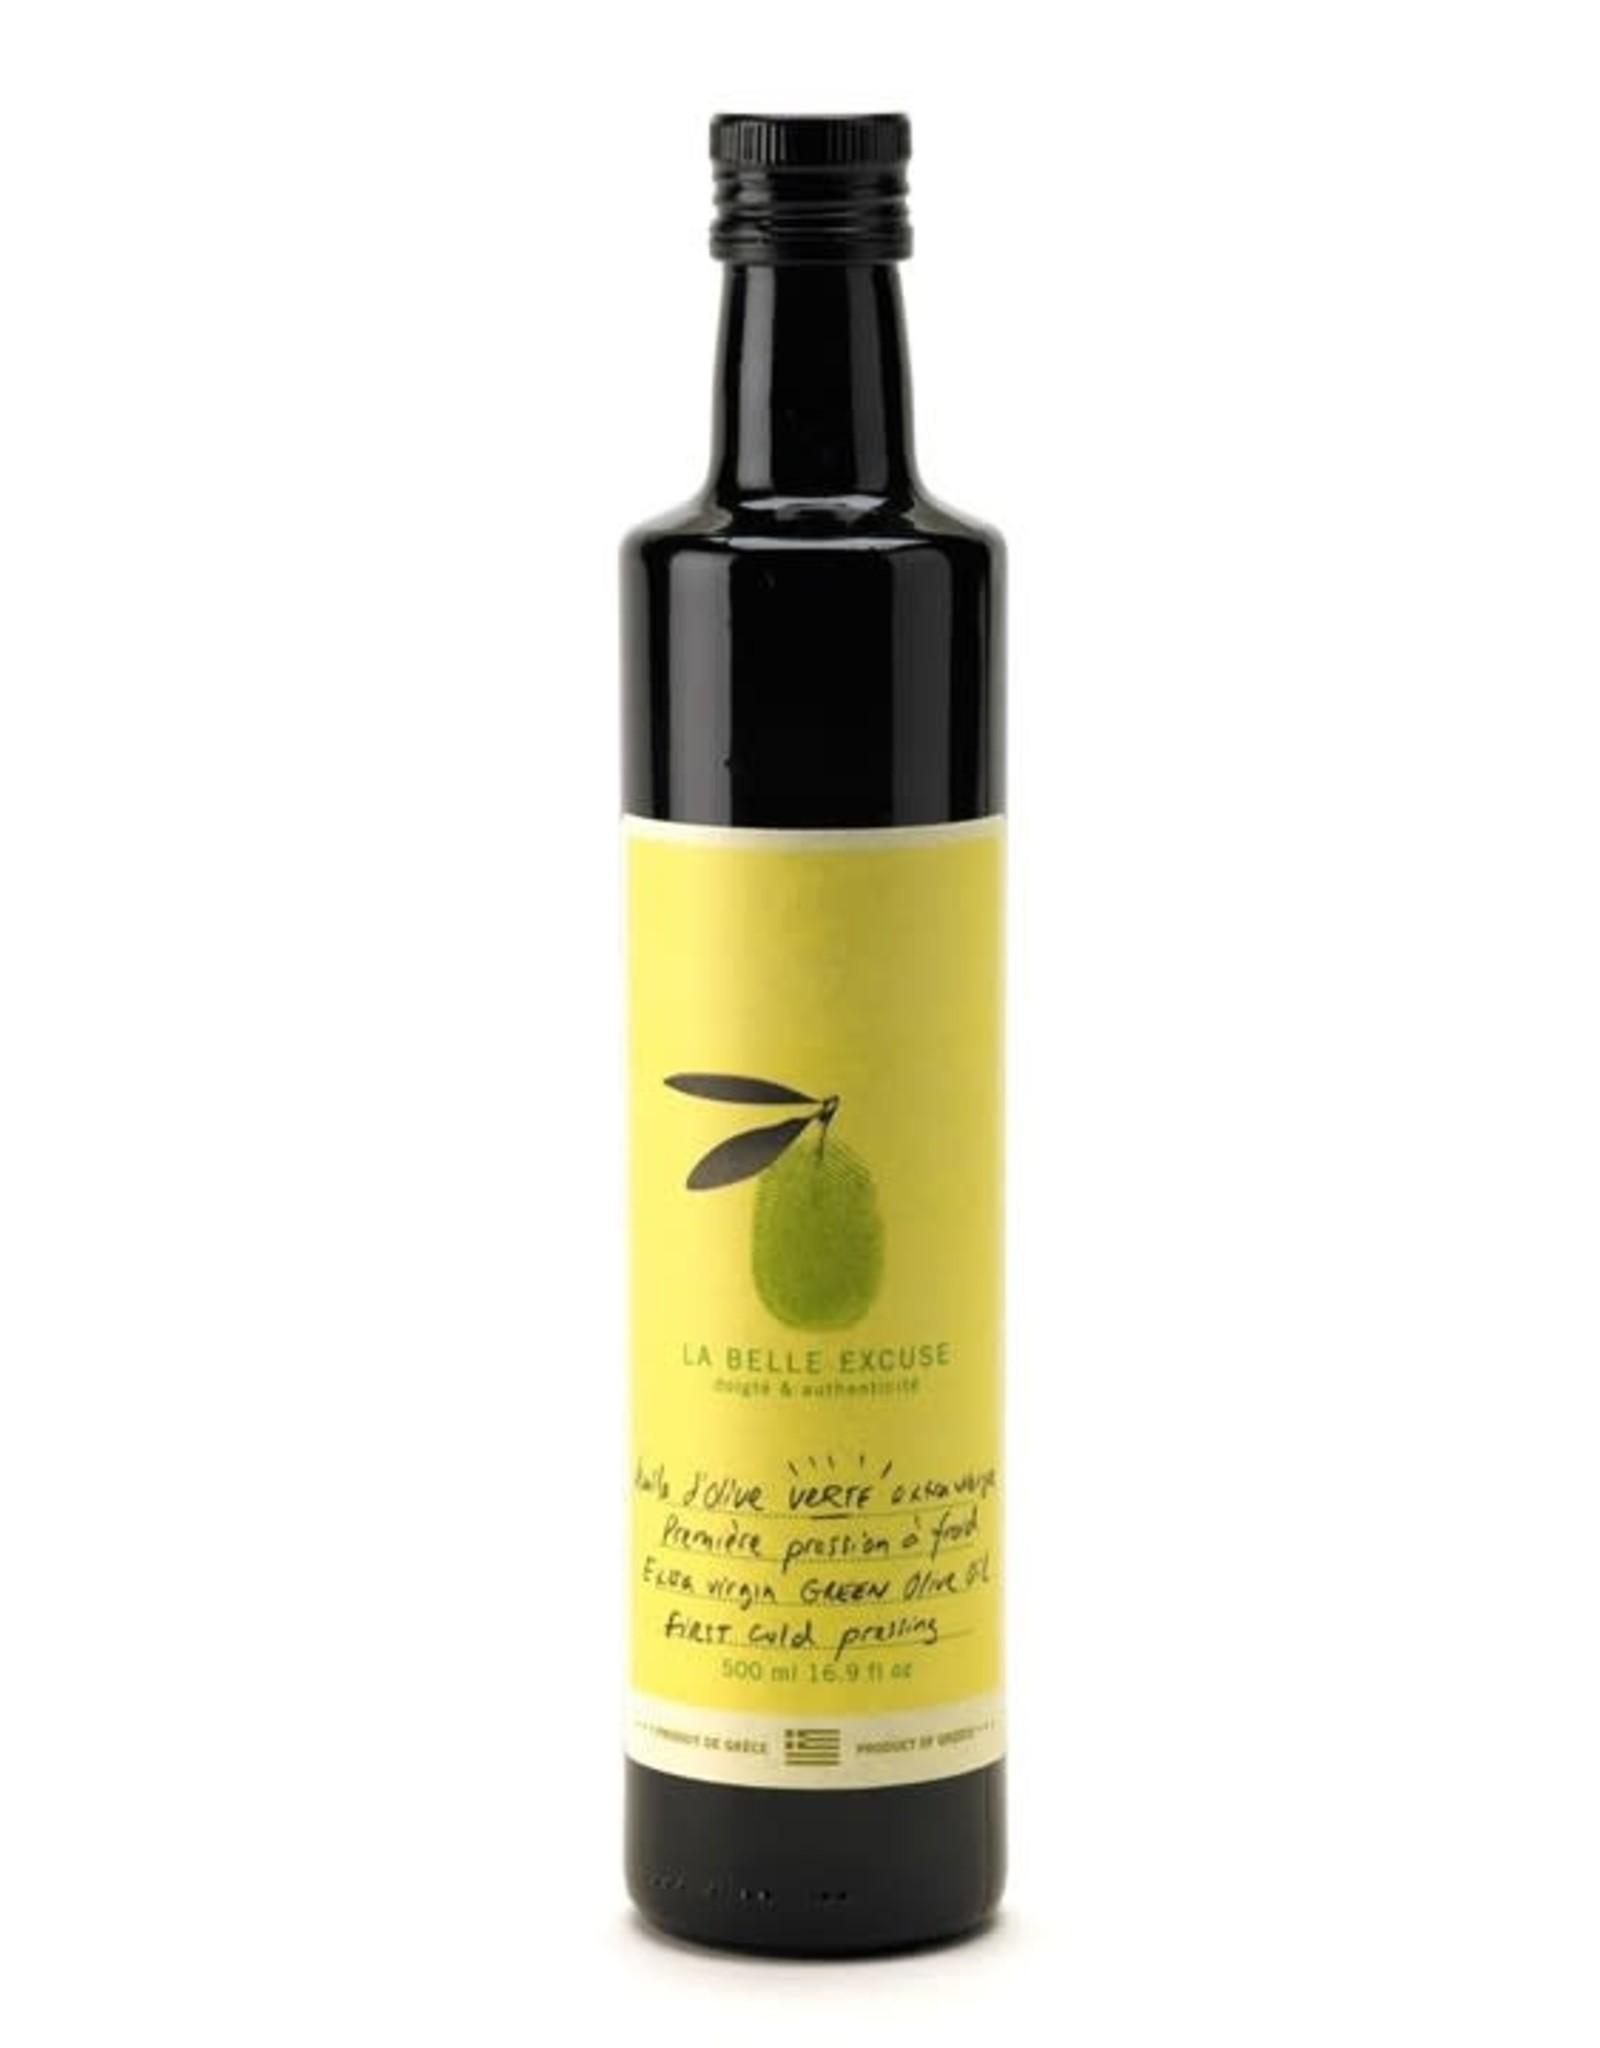 La Belle Excuse Huile d'olive  verte  500 ml